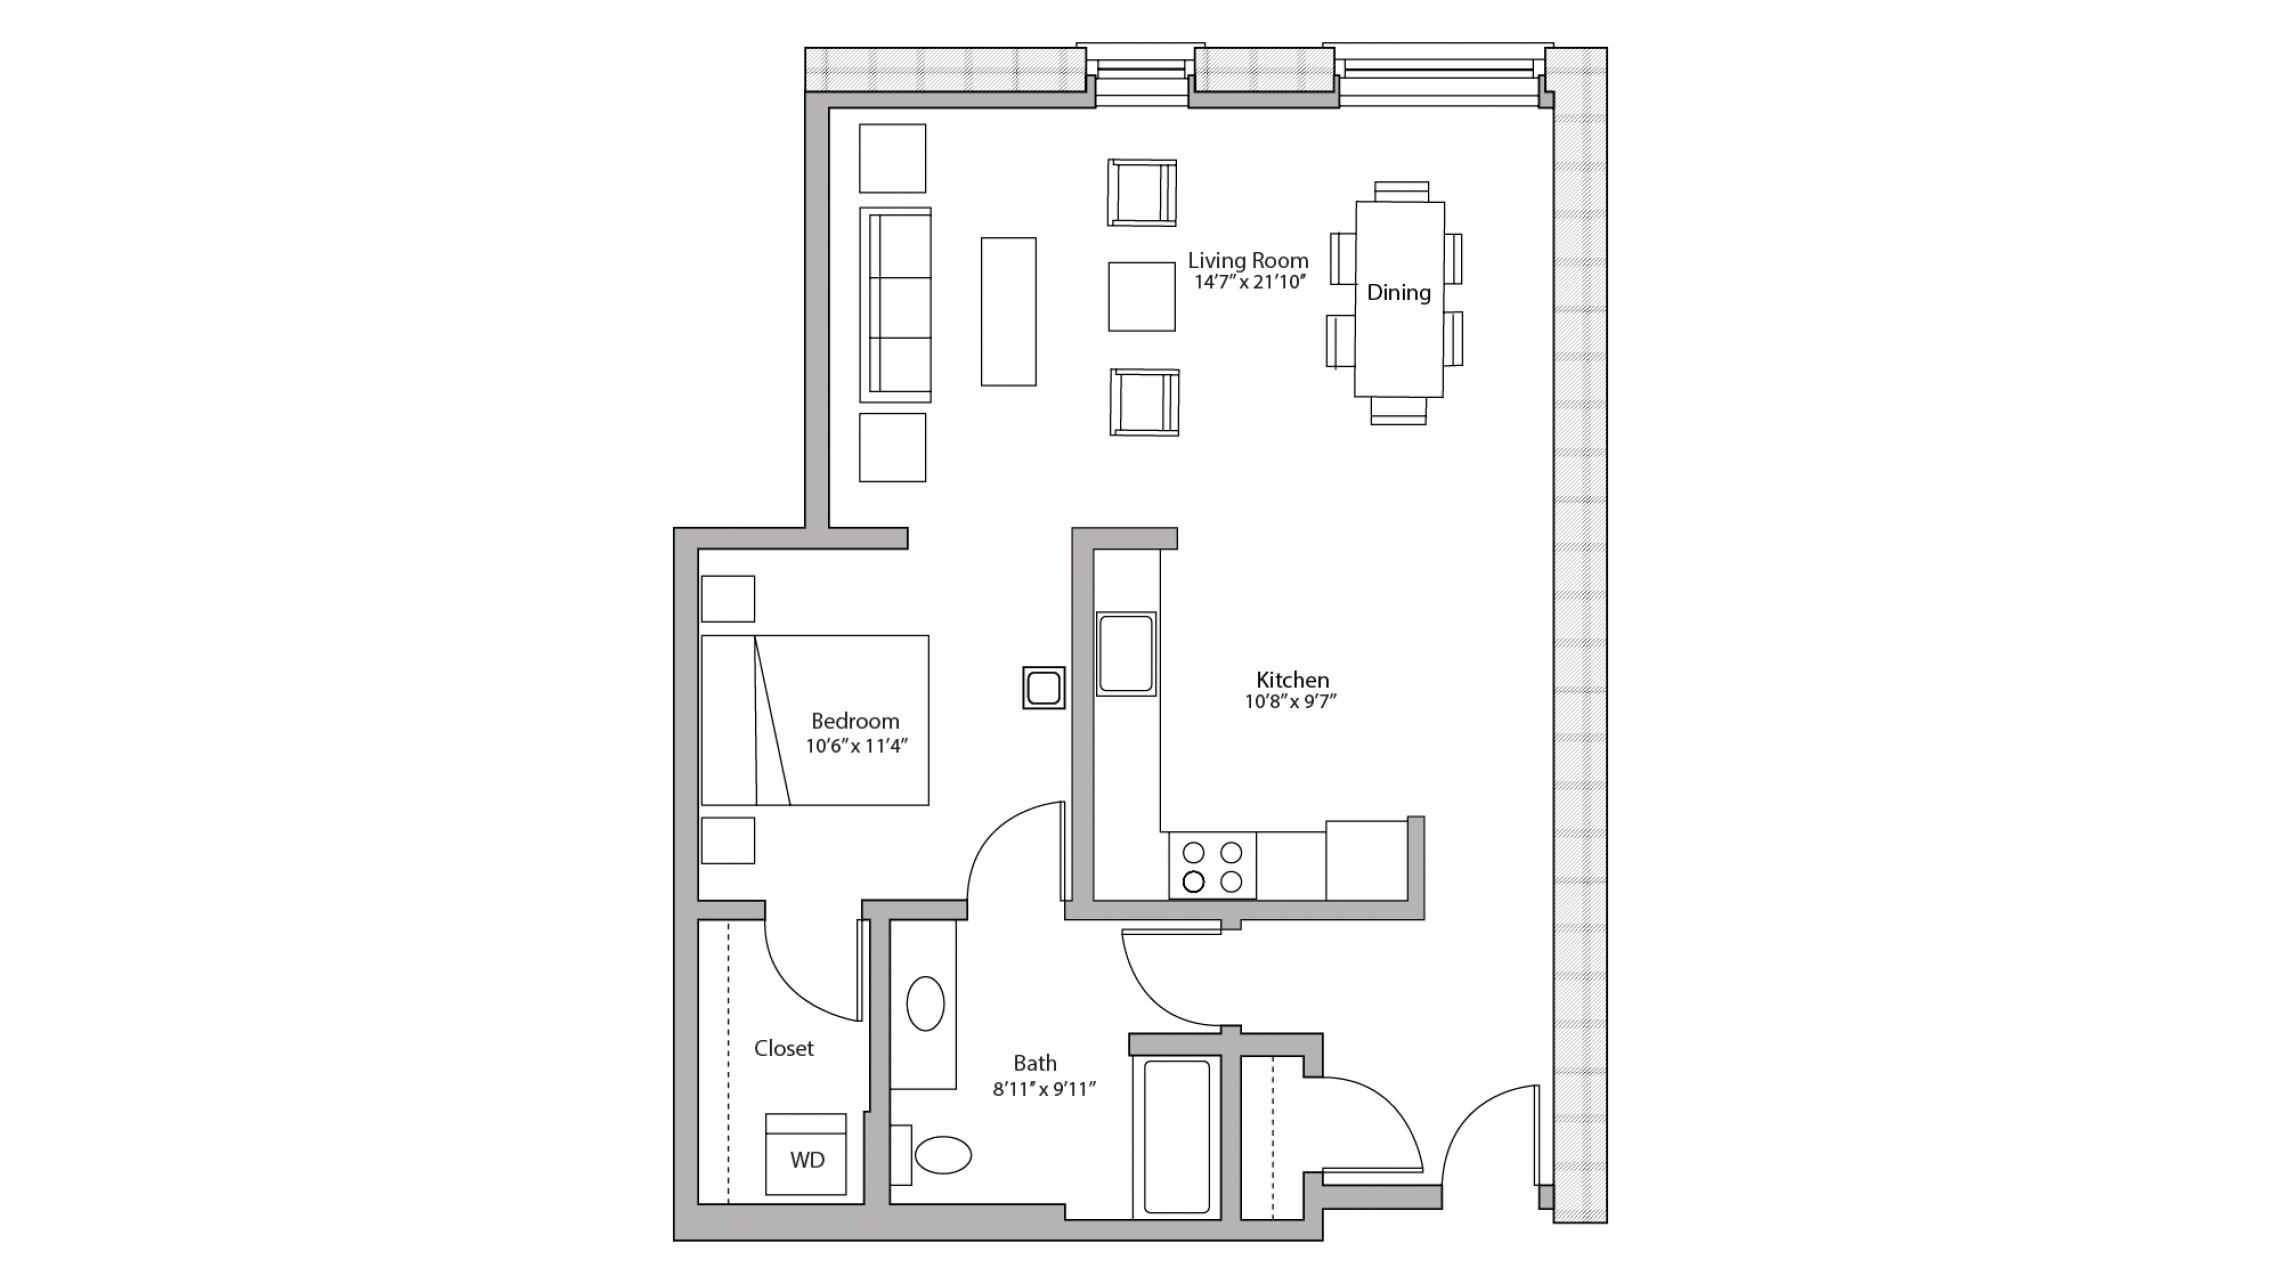 ULI Tobacco Lofts W213 - Studio, One Bathroom